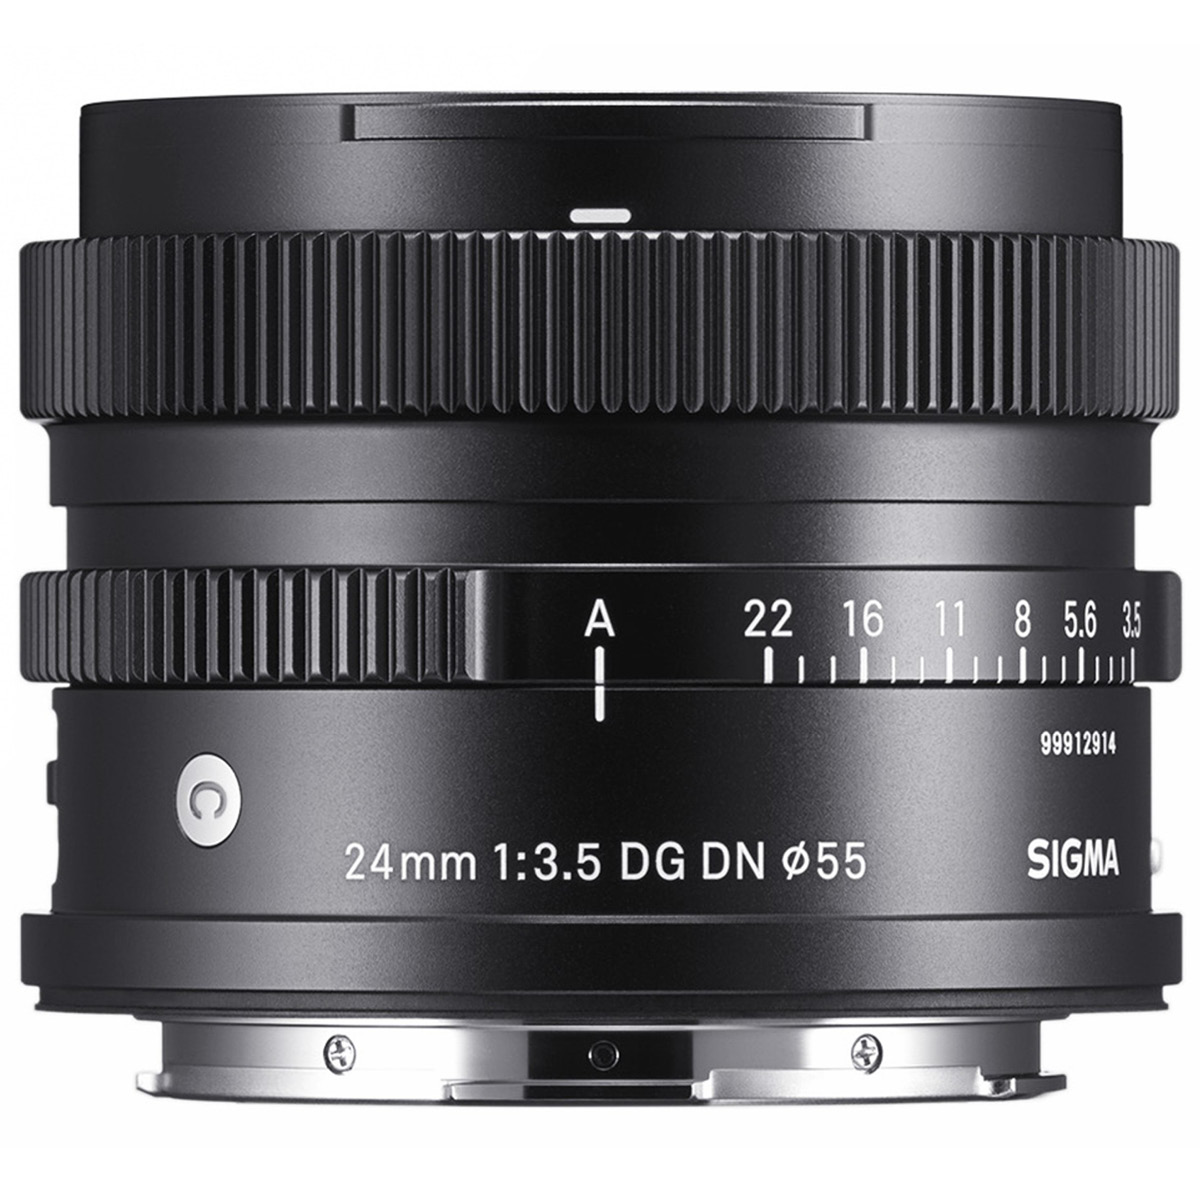 Sigma 24 mm 1:3,5 DG DN (C) L-Mount